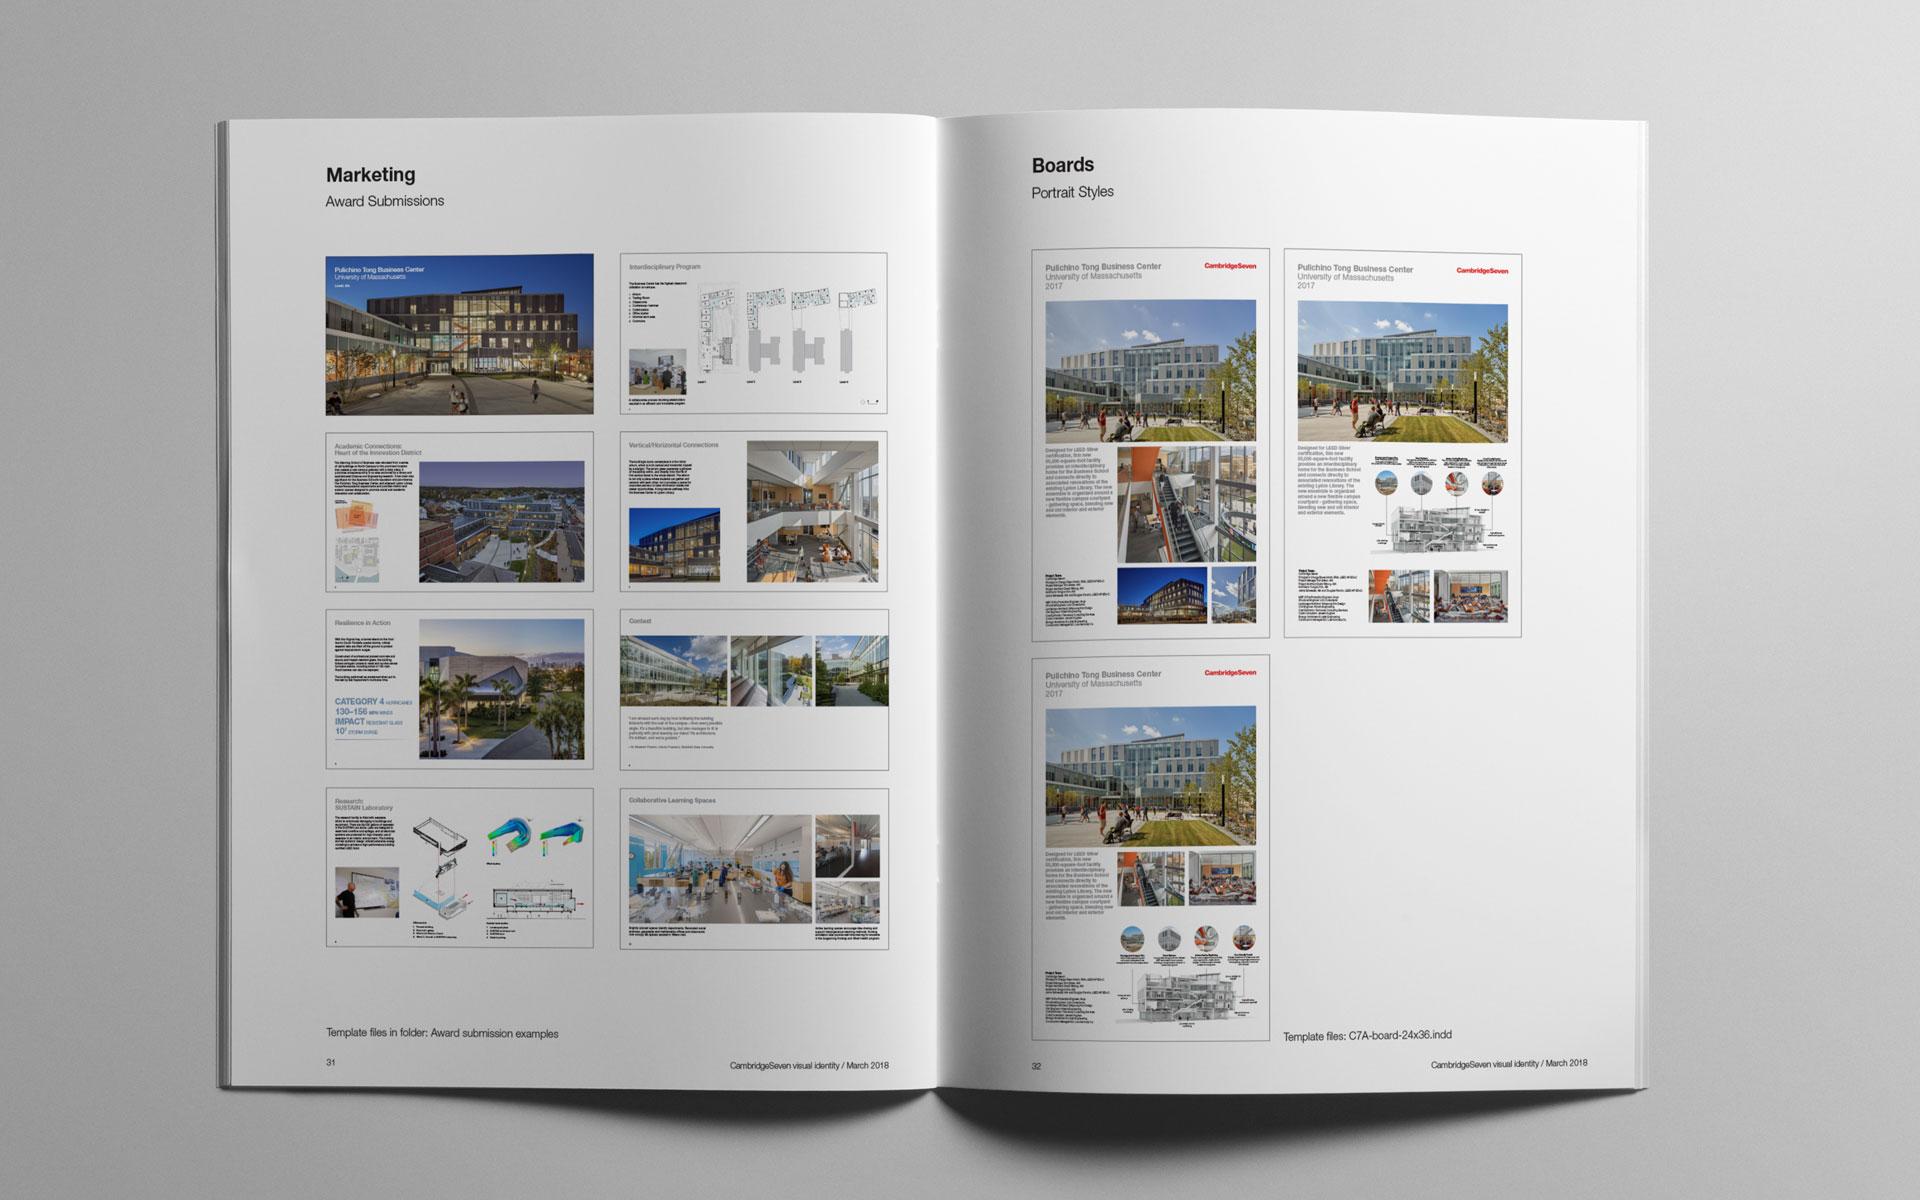 cambridgeseven-branding-manual-2